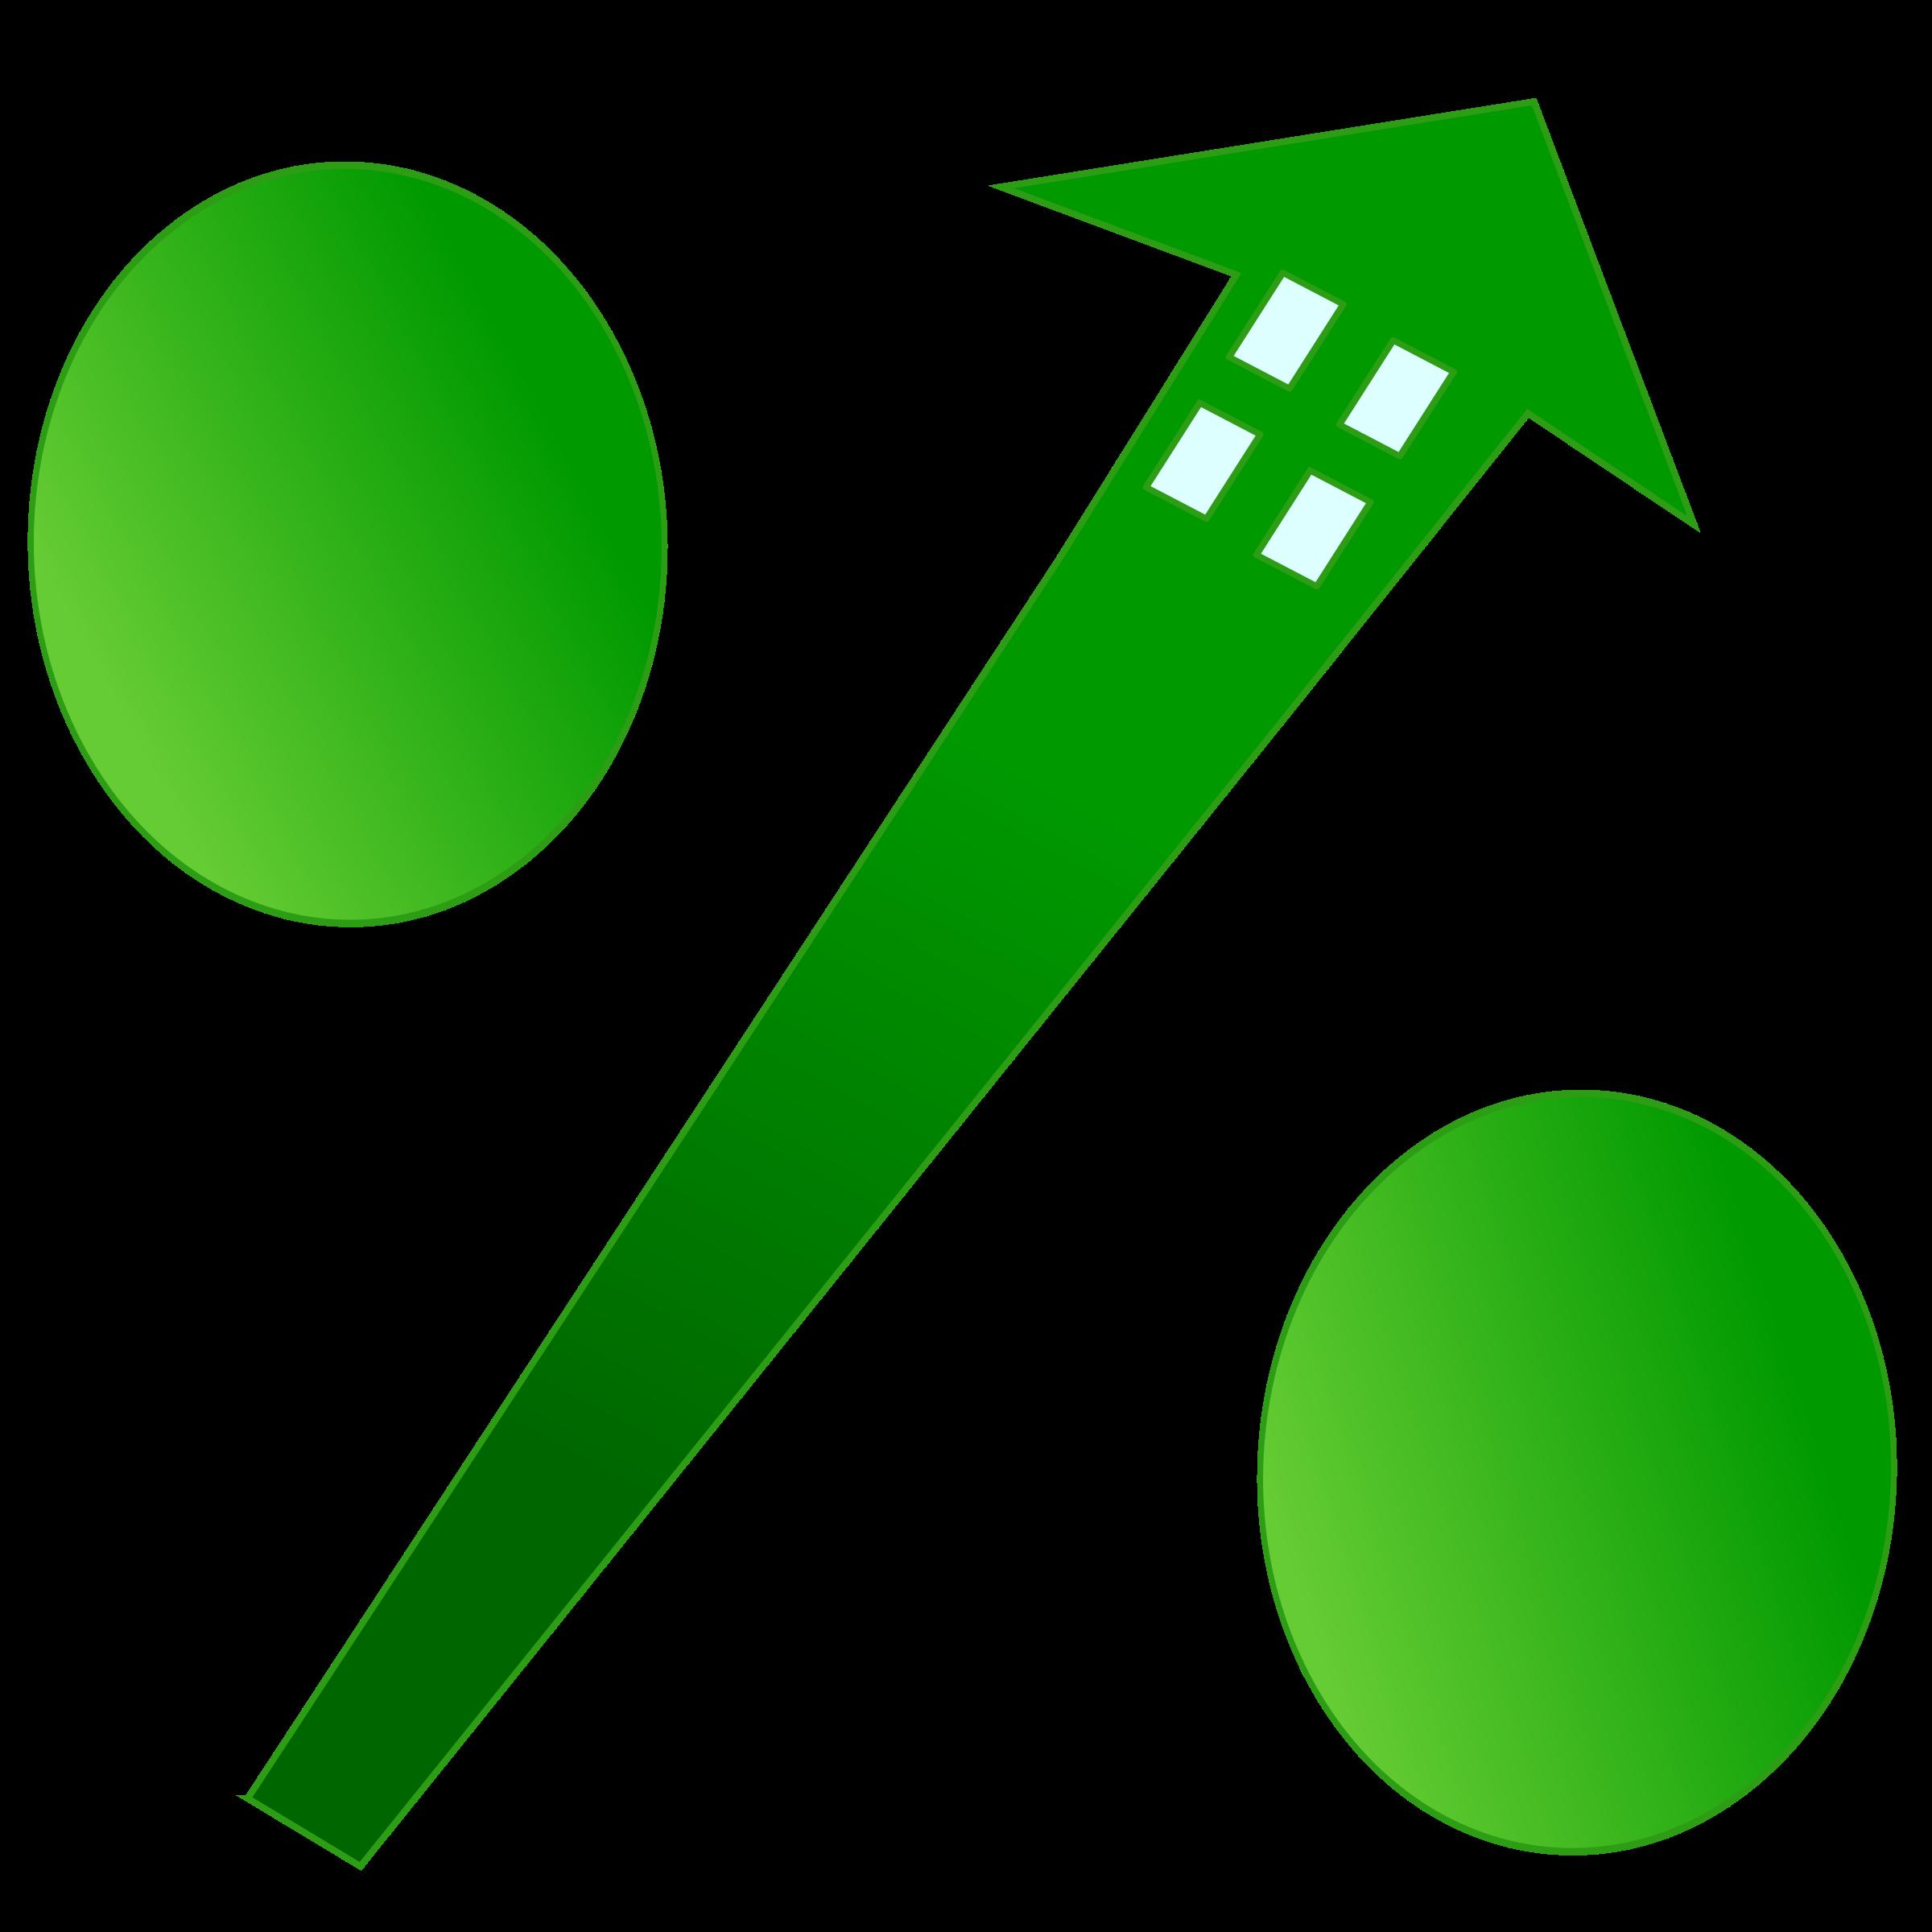 Rate clipart Clipart mortgage rate mortgage rate